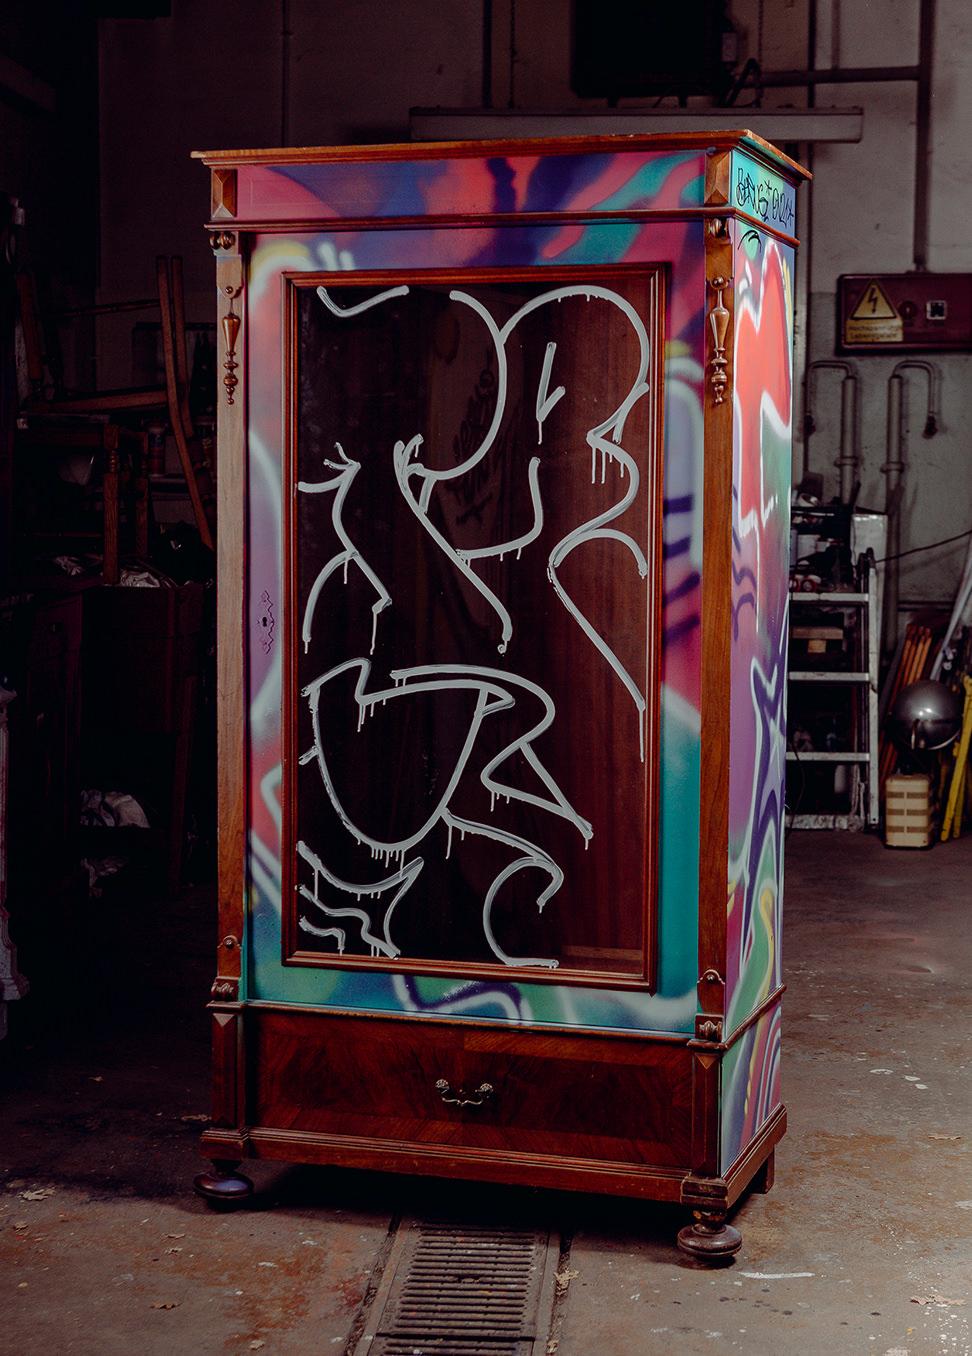 ohpardon-graffiti-furniture-streetart-custom-furniture-04-2019_mg_0571